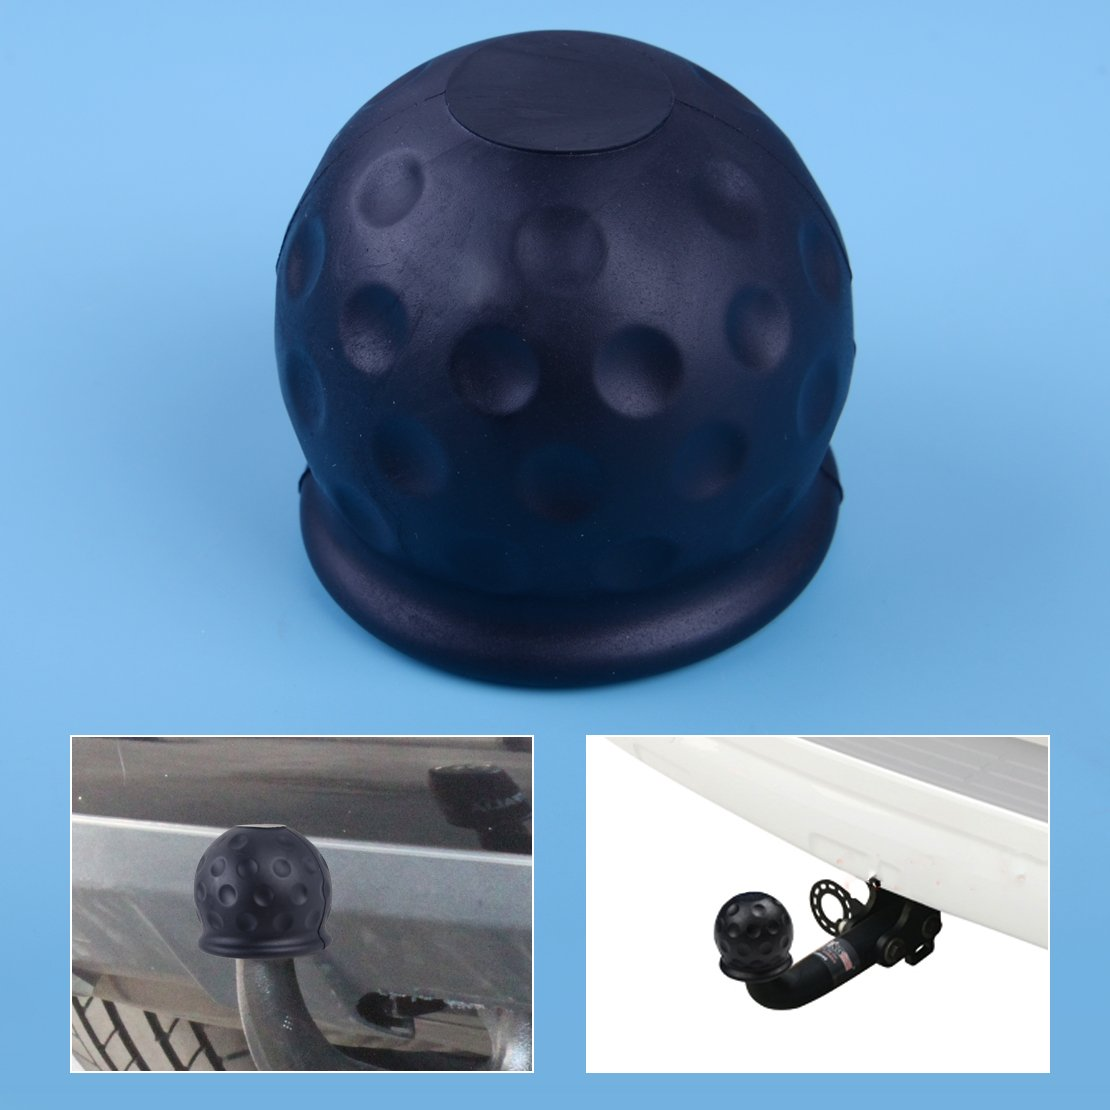 beler Car Rubber Black 50mm Tow Ball Towball Protector Cover Cap Hitch Caravan Trailer